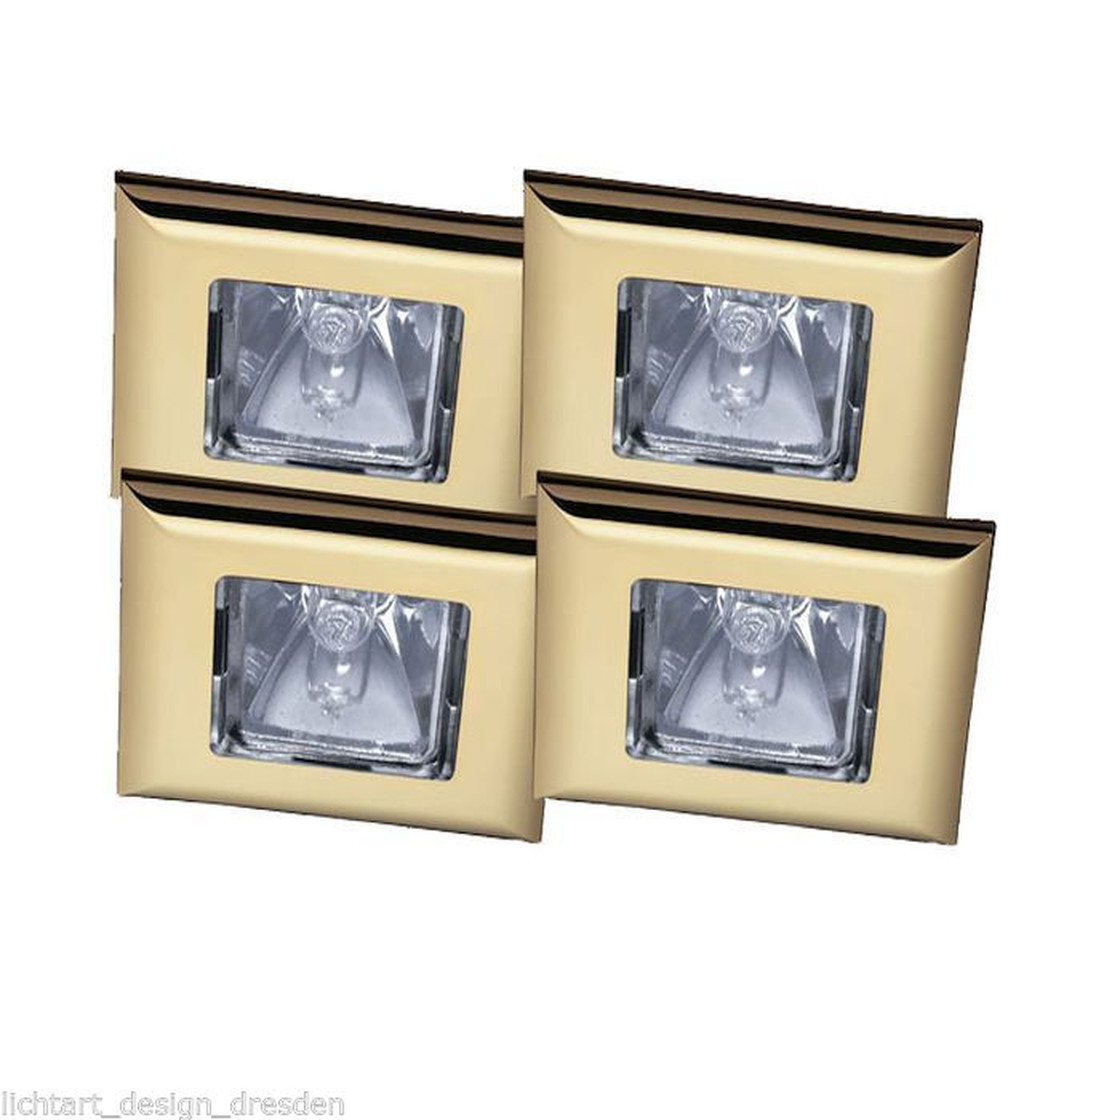 paulmann quadro premium line einbauleuchten set 4 x35w gu5 3 g 29 50. Black Bedroom Furniture Sets. Home Design Ideas